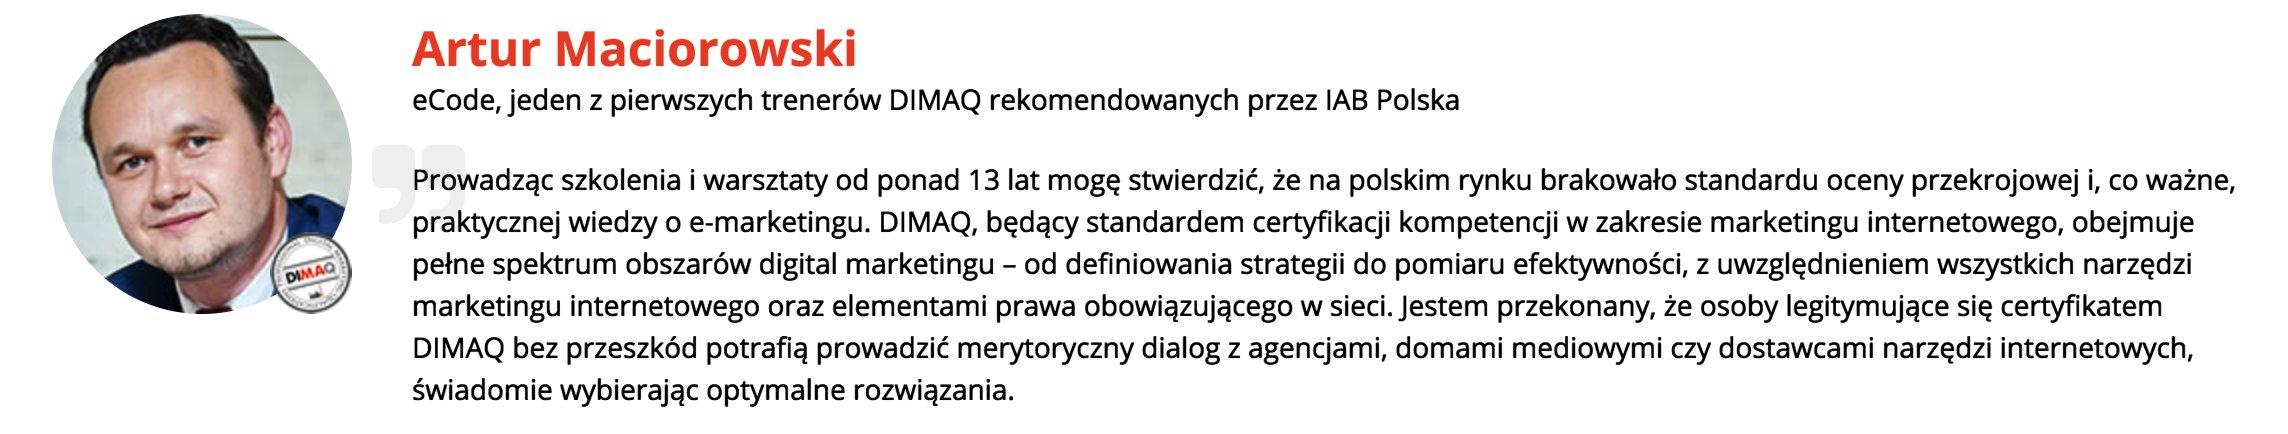 Artur Maciorowski trener IAB DIMAQ